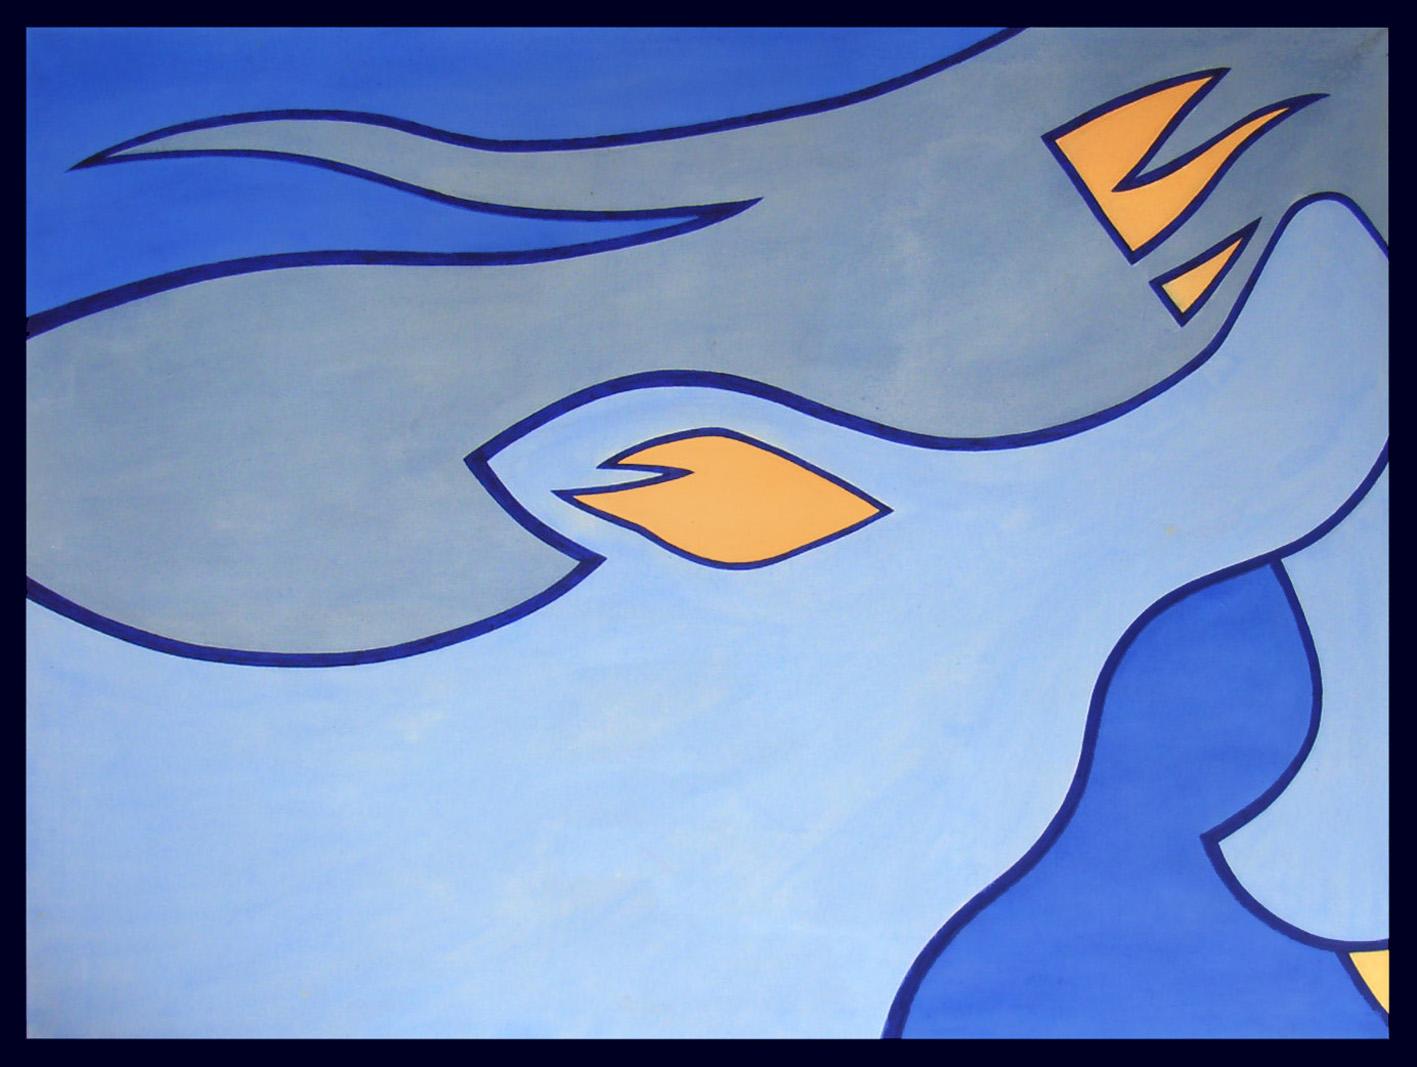 Wind in her dress - Blue